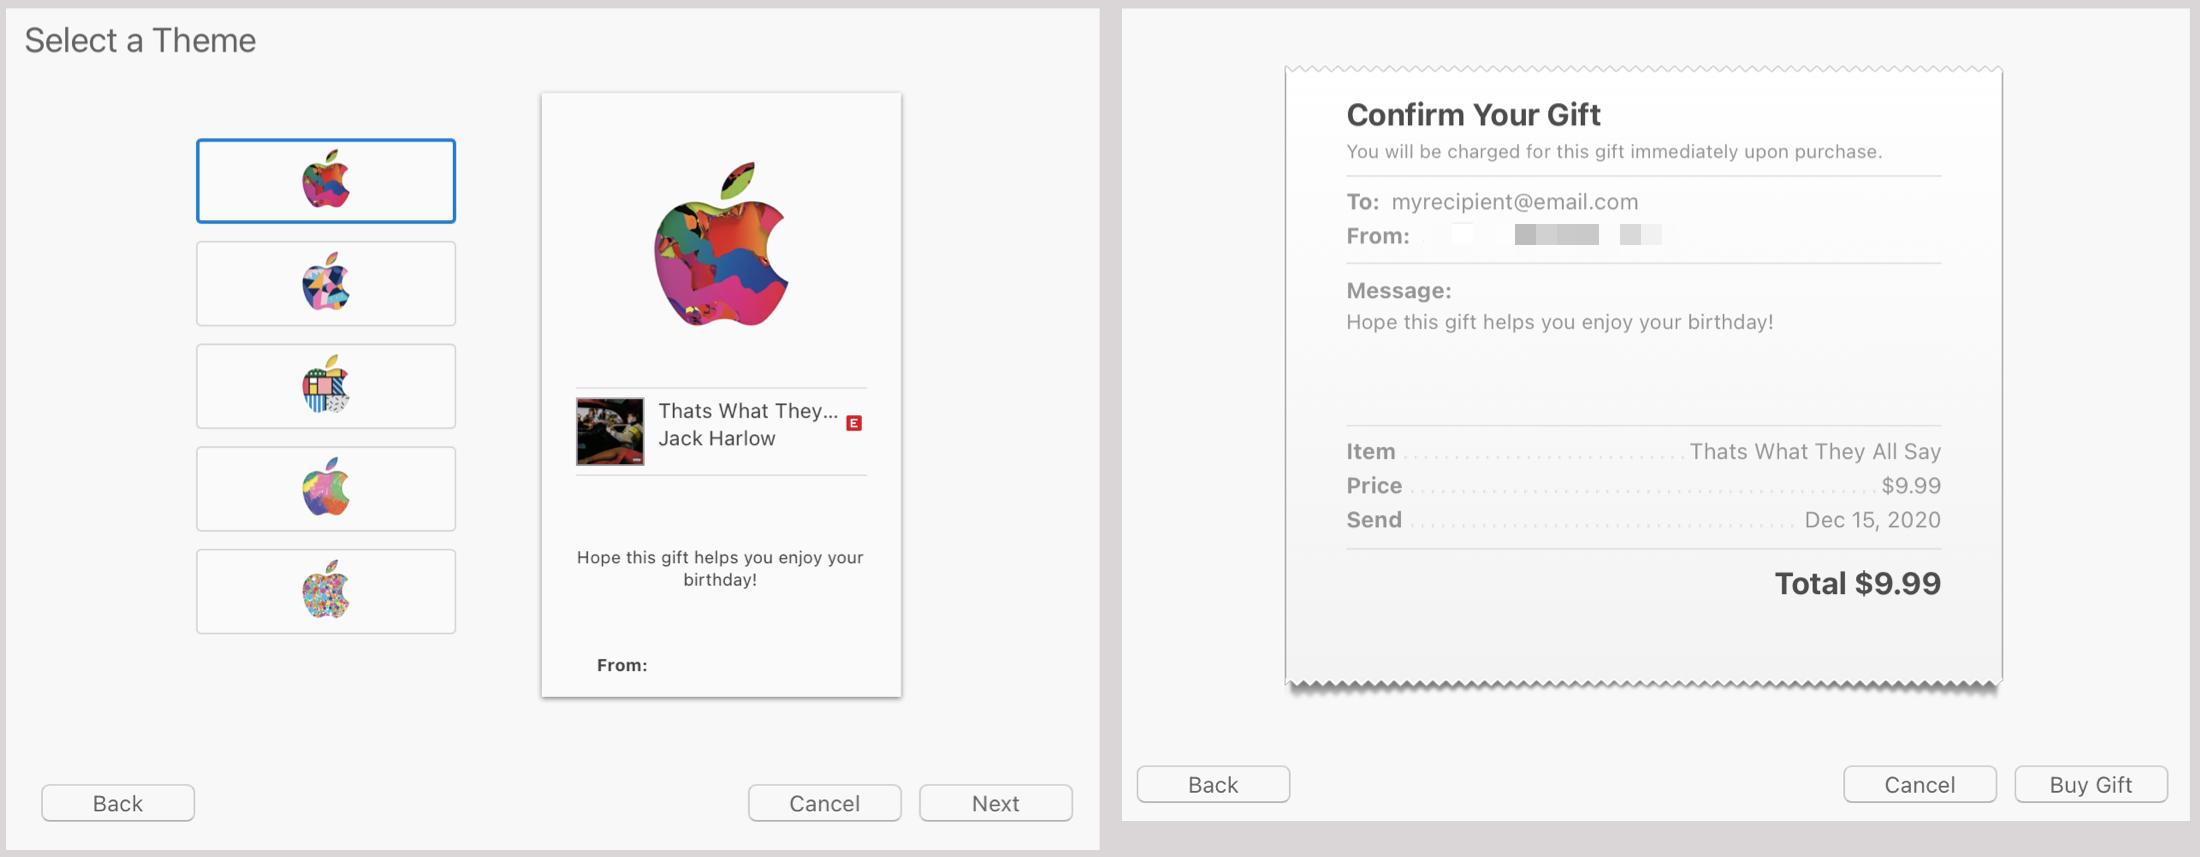 Buy Gift in iTunes on Mac